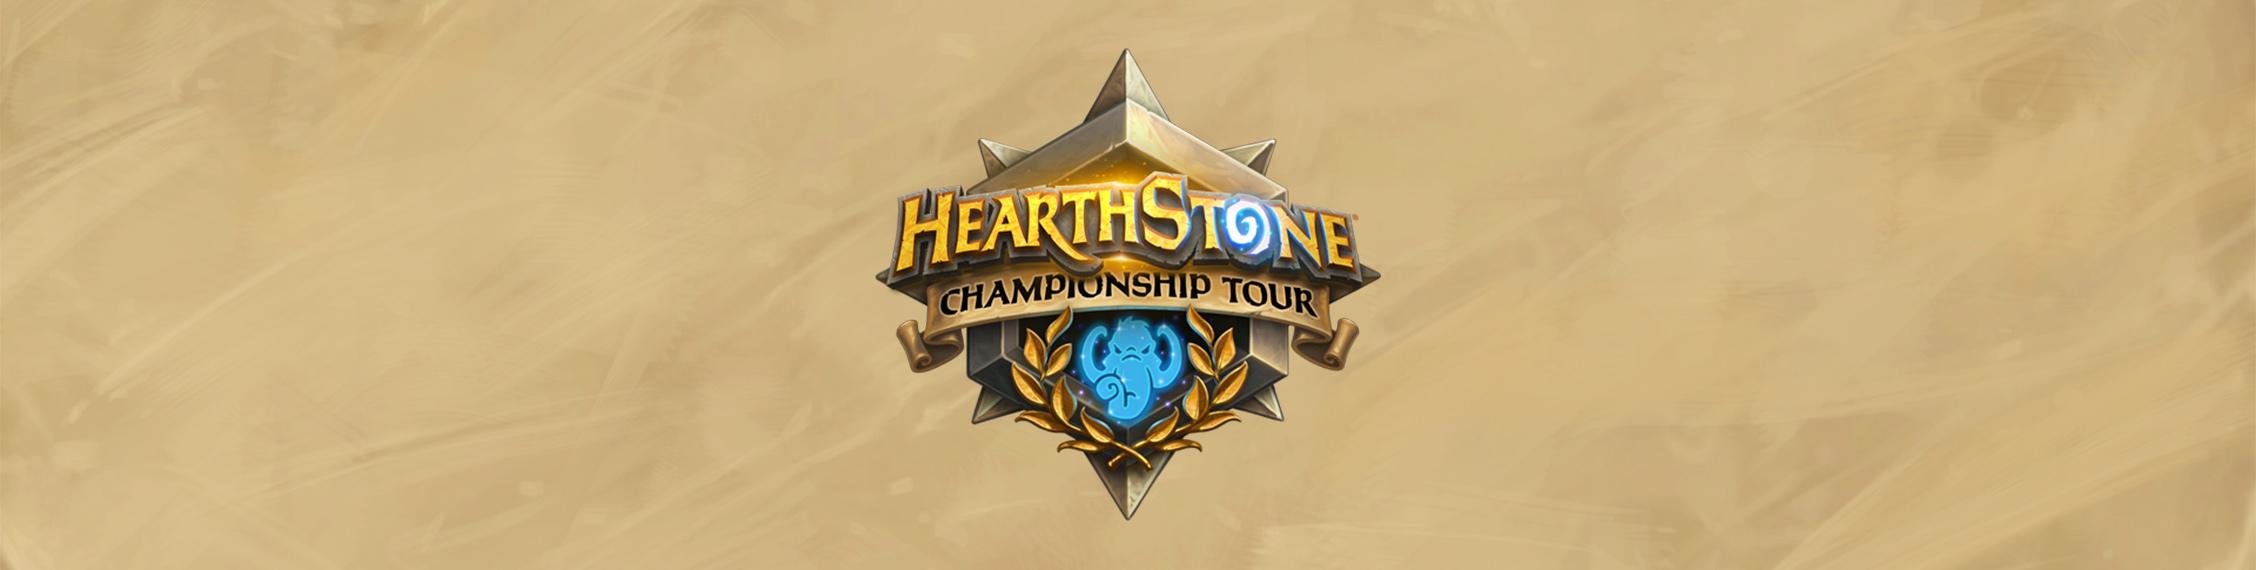 Hearthstone World Championship 2017